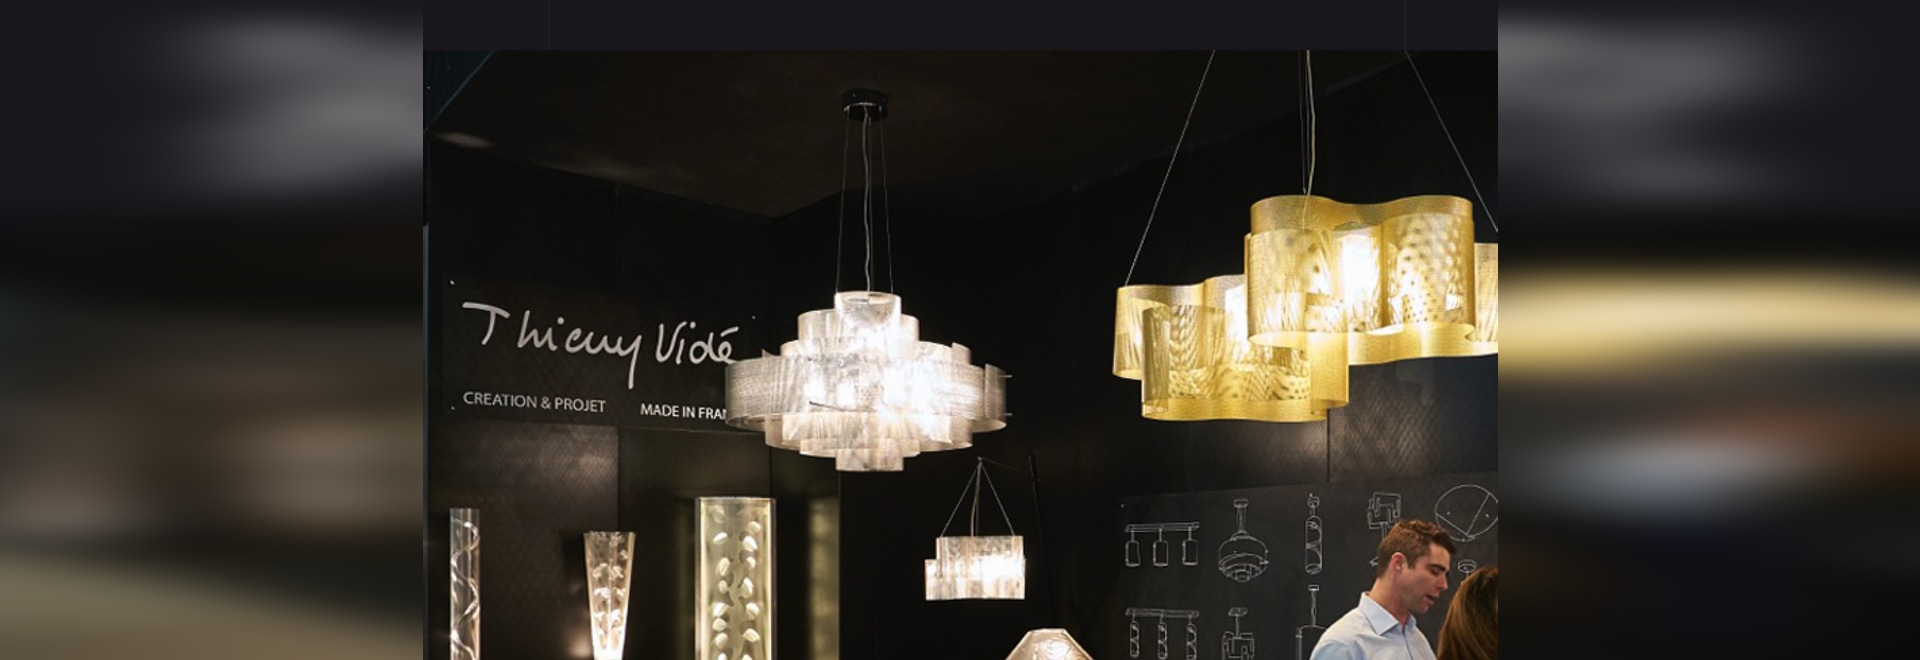 Thierry Vidé Design will be at Maison & Objet fair 08-12 September 2017